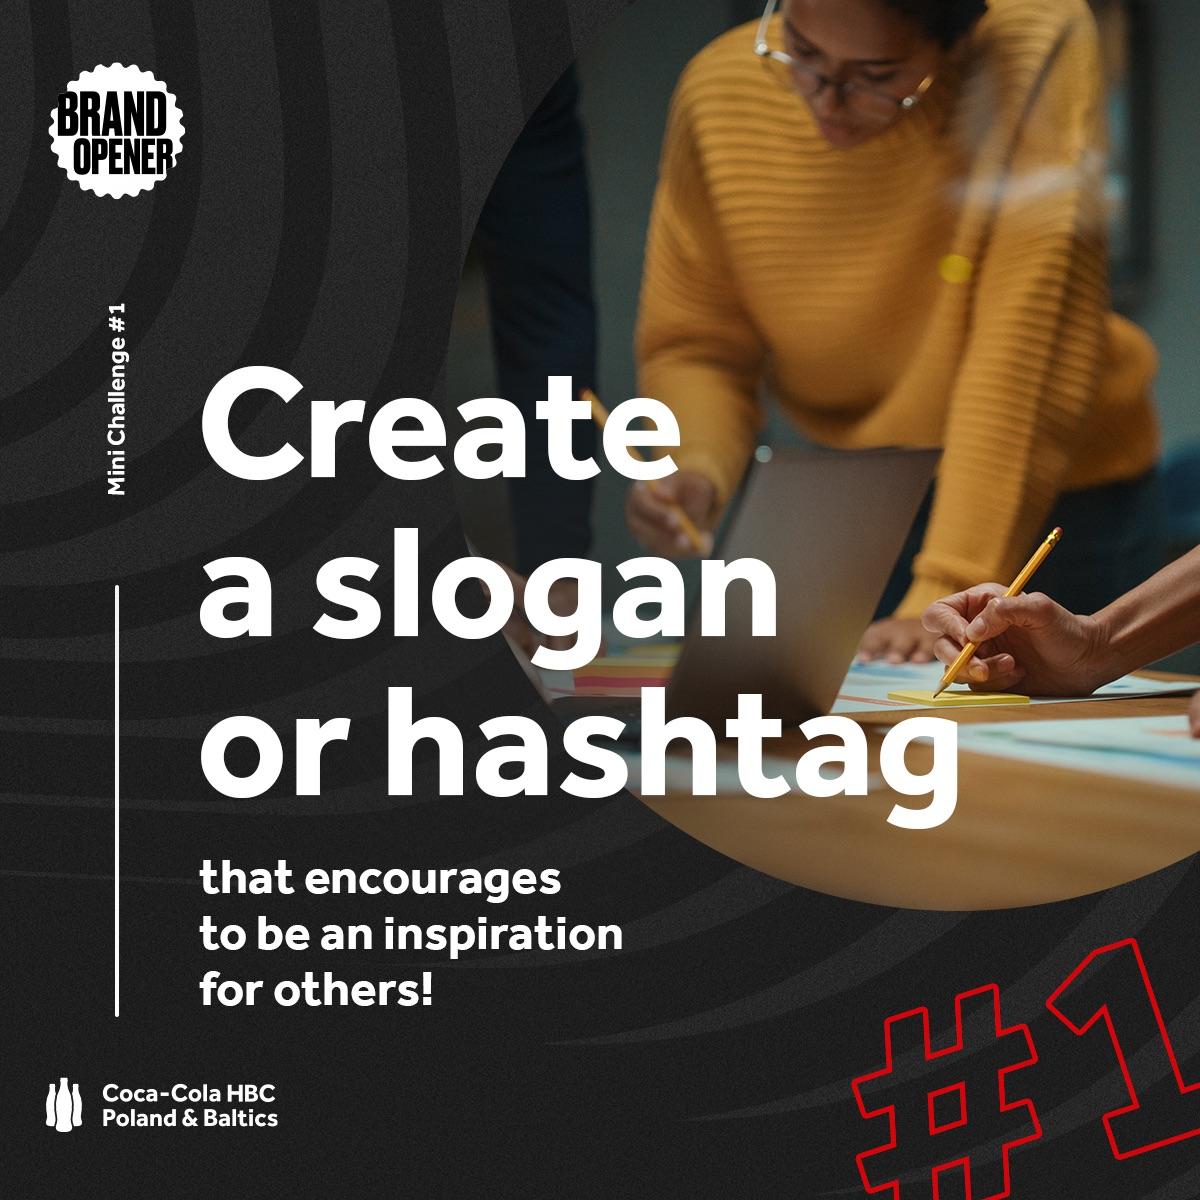 Rusza właśnie druga edycja konkursu @Brand Opener – Coca-Cola HBC Poland and Baltics